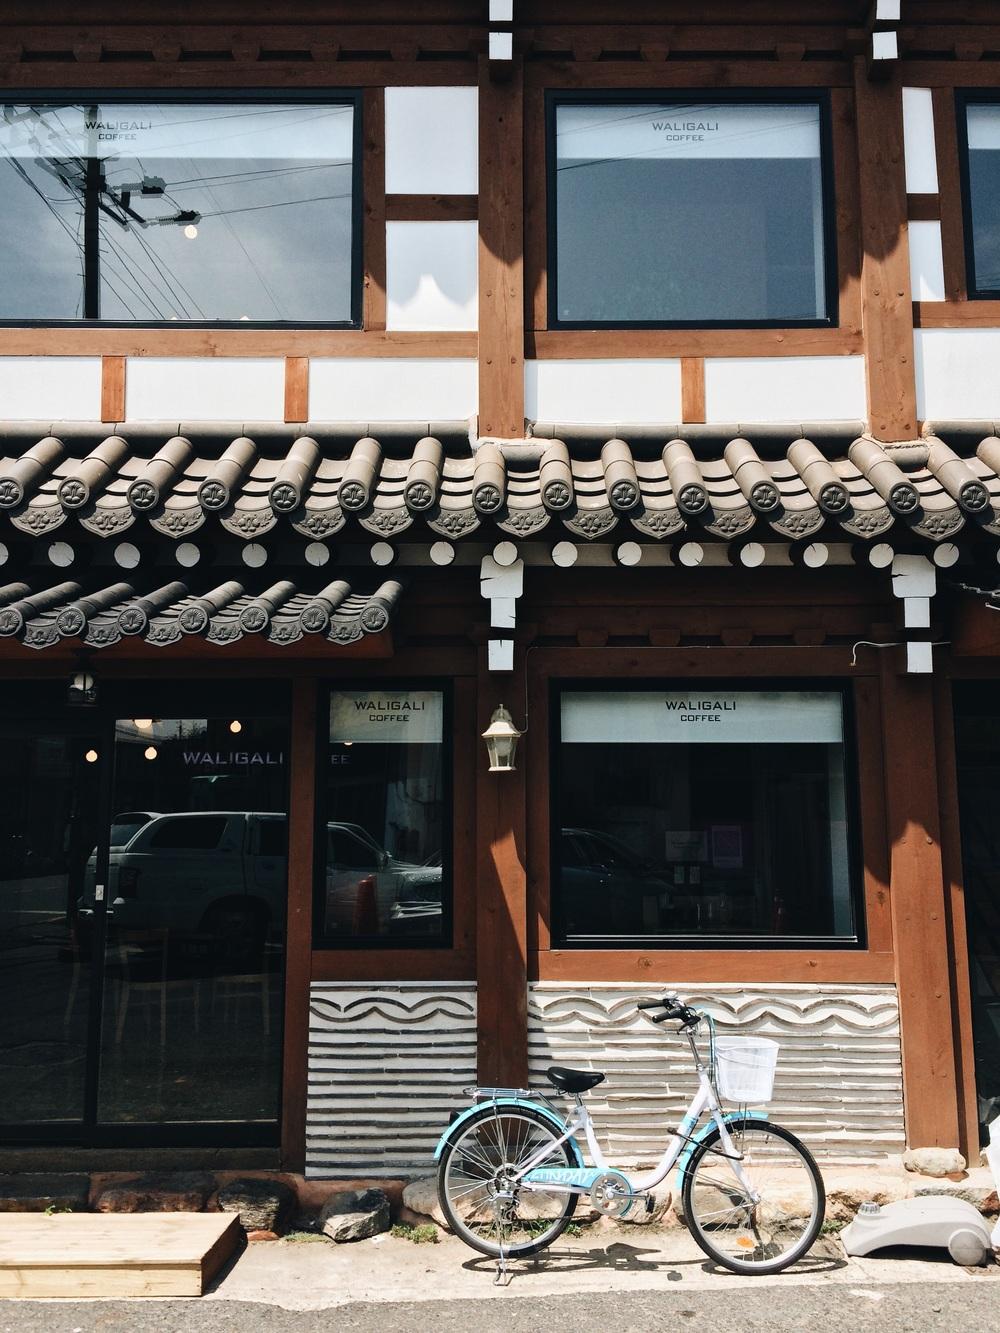 Biking in the old city, Gyeongju